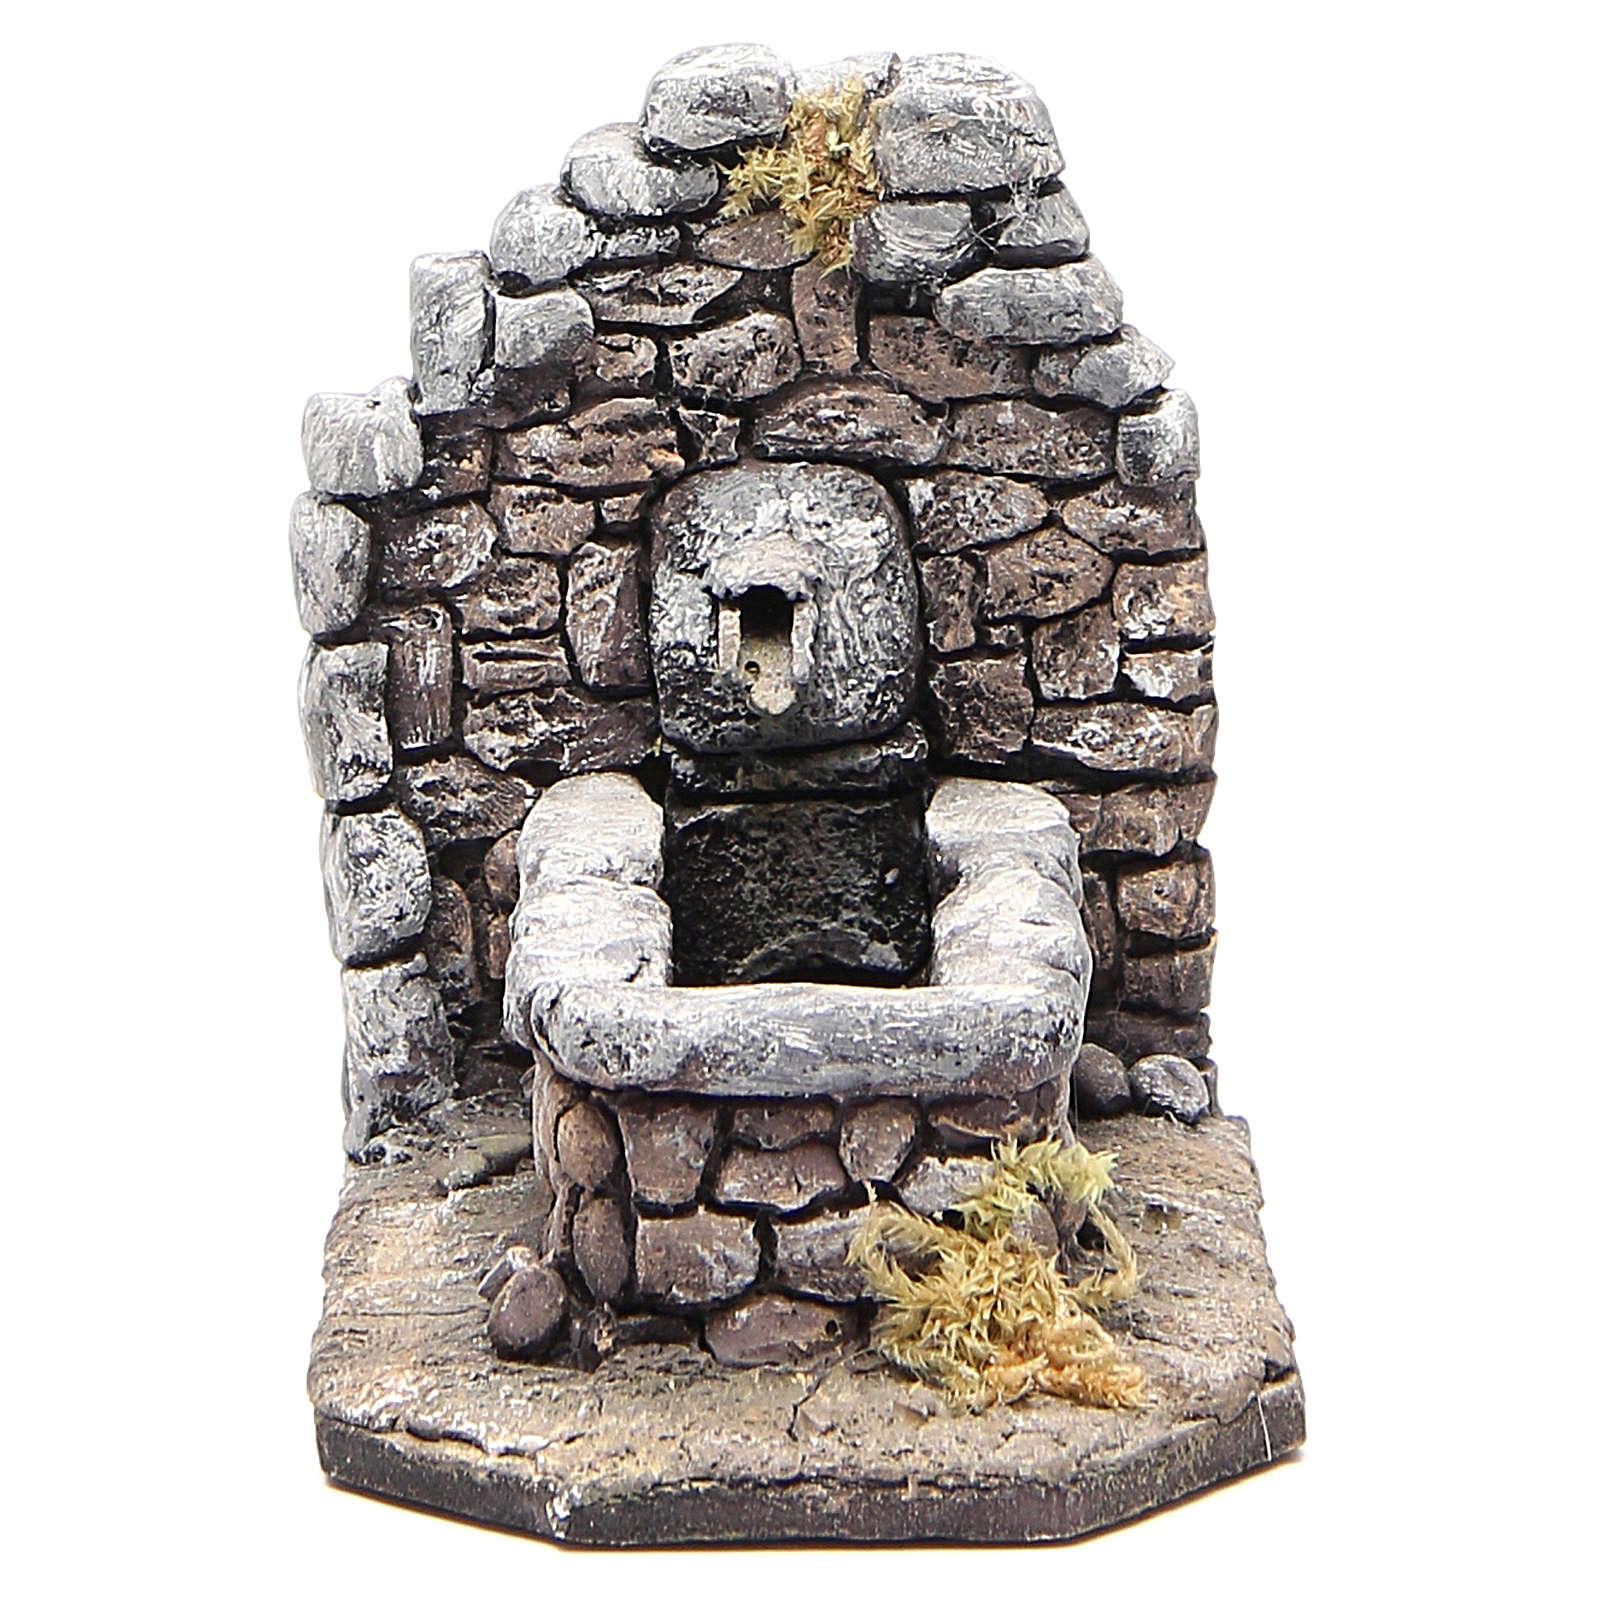 Fuente de resina tipo roca para belén 11x16x8 cm 4